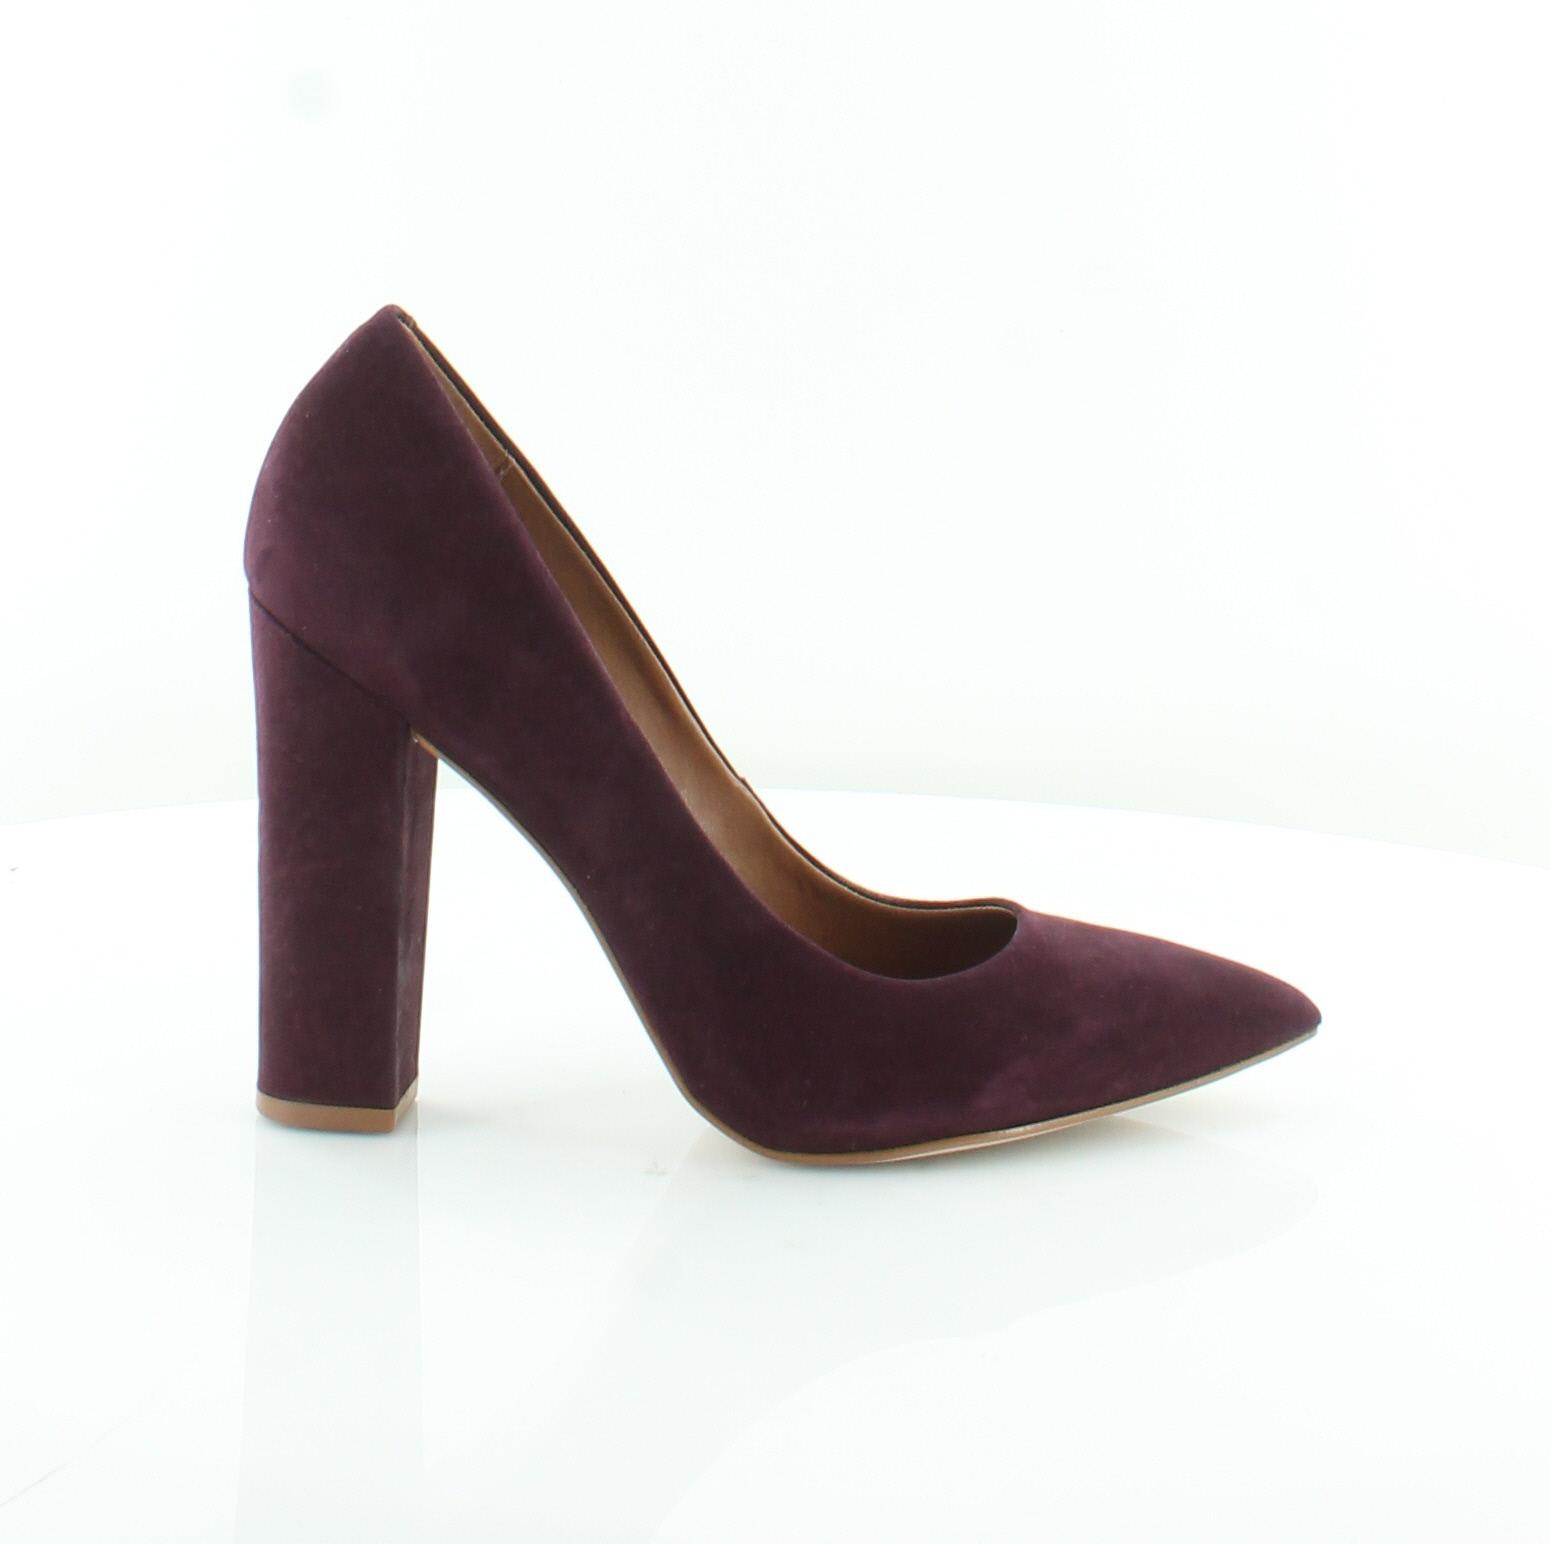 02bca5987b2 STEVE MADDEN PRIMPY Women s Heels Burg Nubk Size 10 M -  29.99 ...